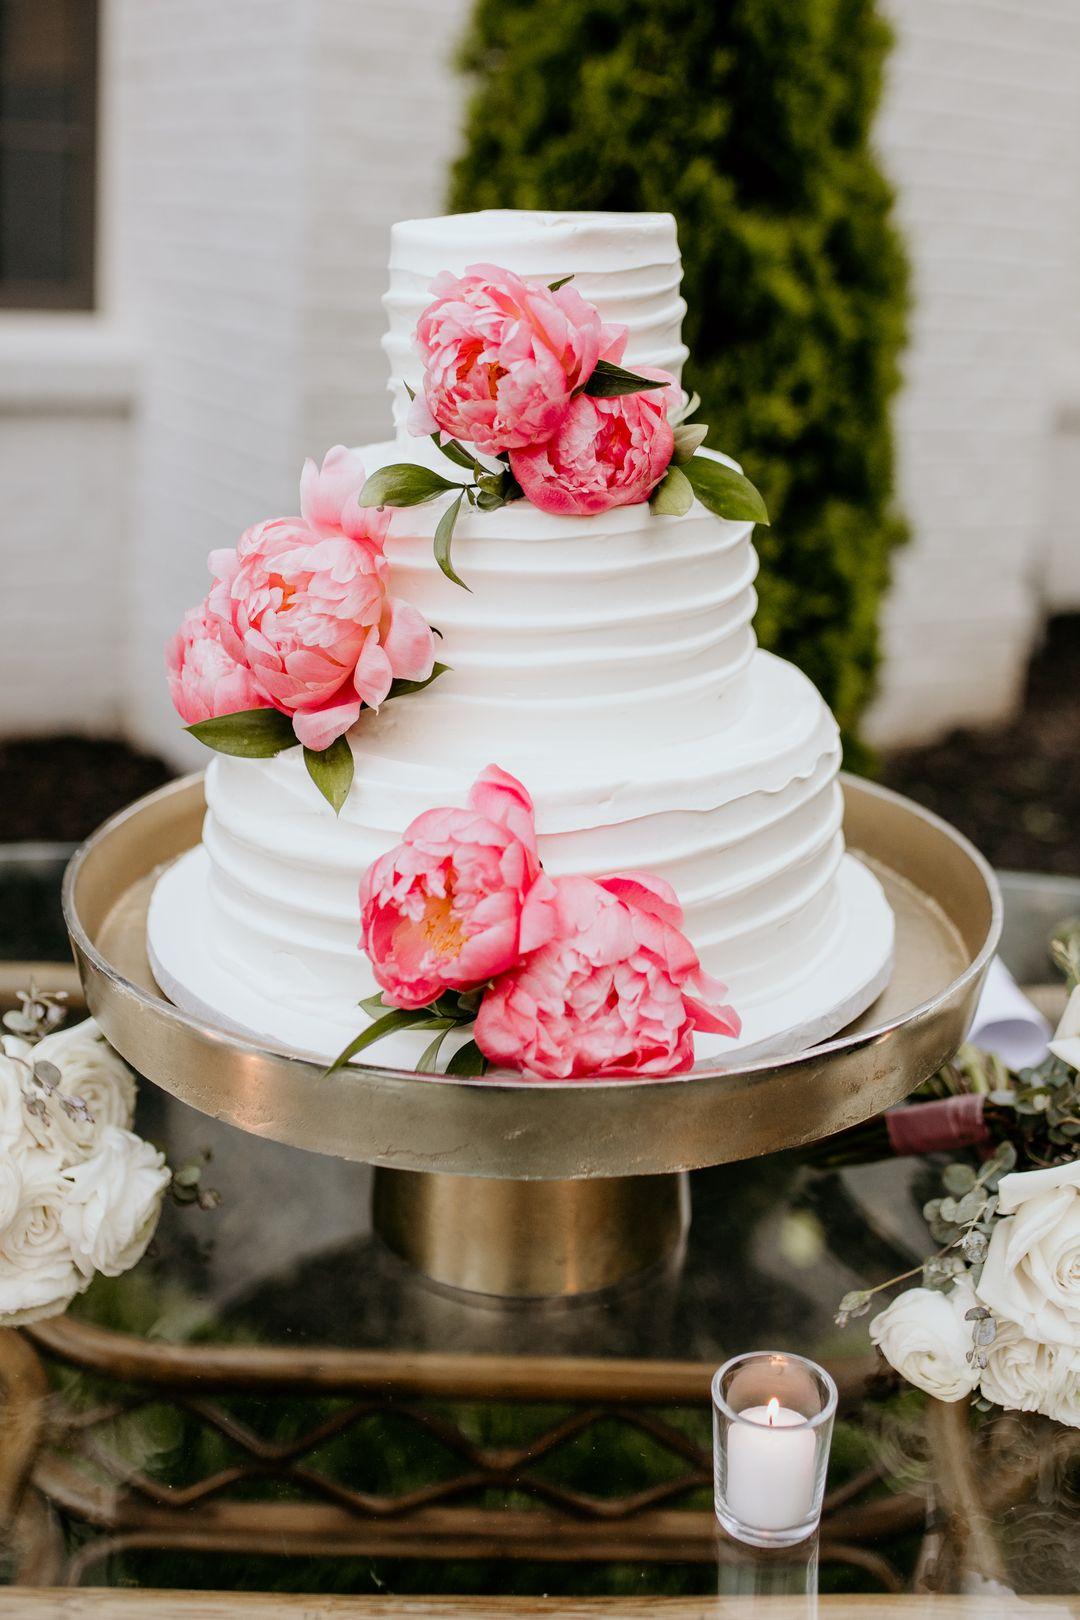 white wedding cake on gold stand